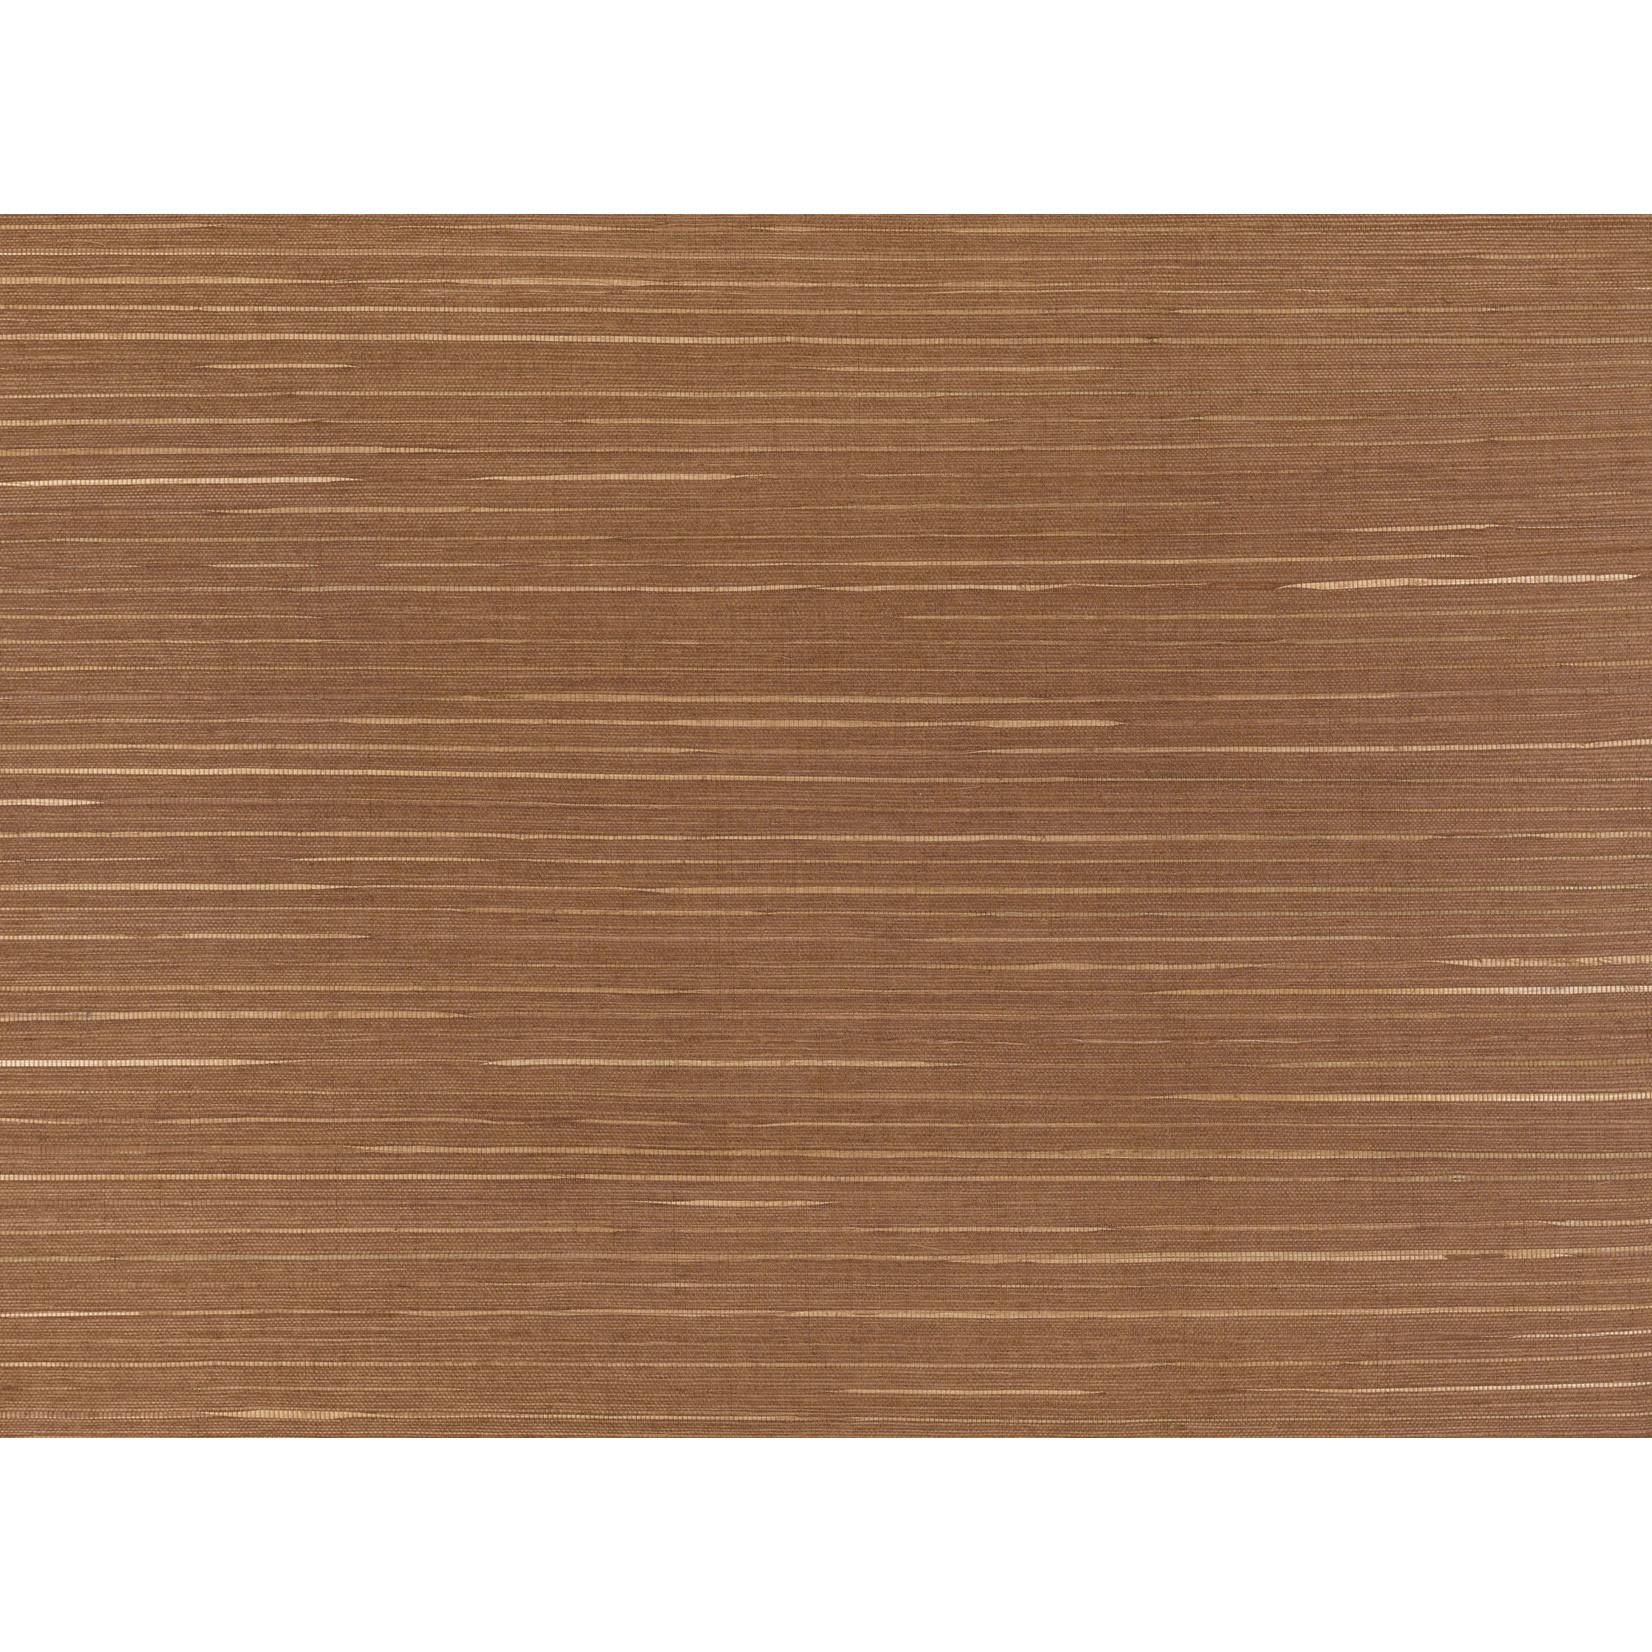 Mark Alexander Grasscloth Handwoven Wallcoverings | Seagrass Paprika